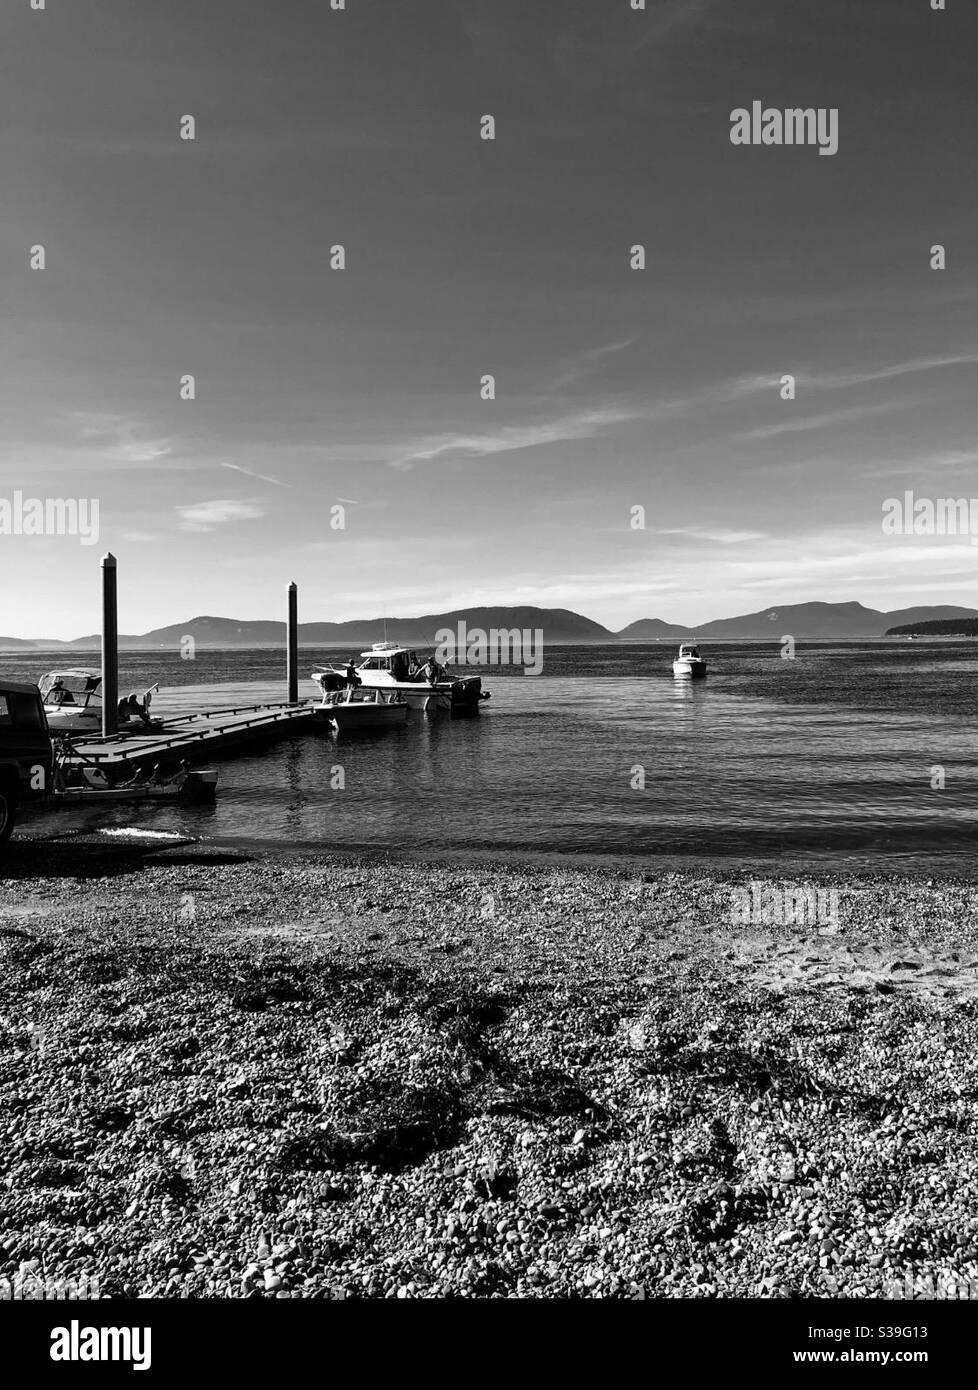 Boats at anacortes washington Stock Photo